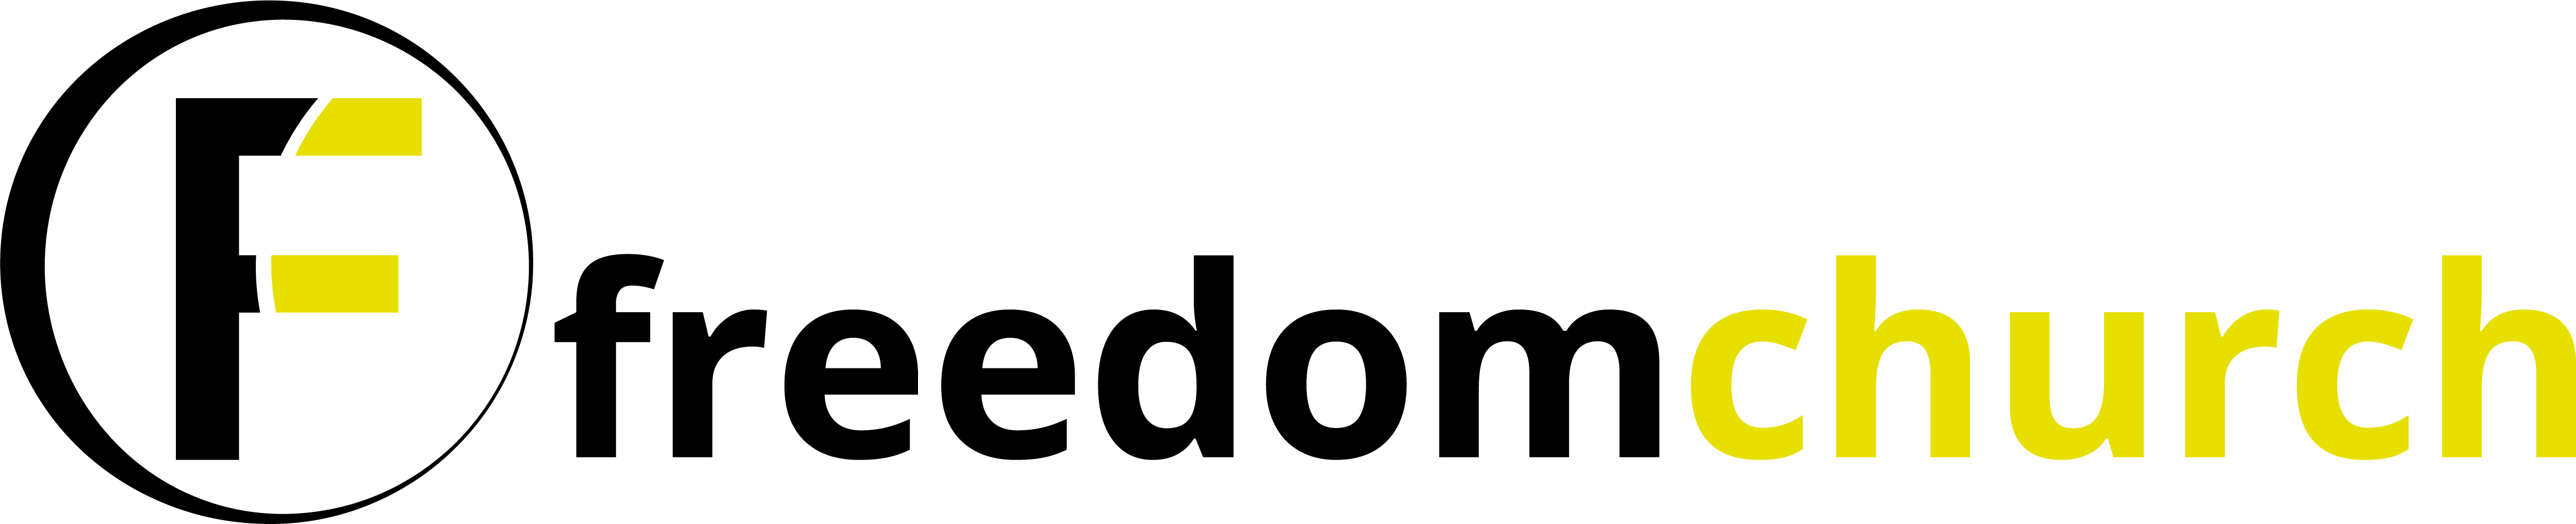 Freedom Church Mereside